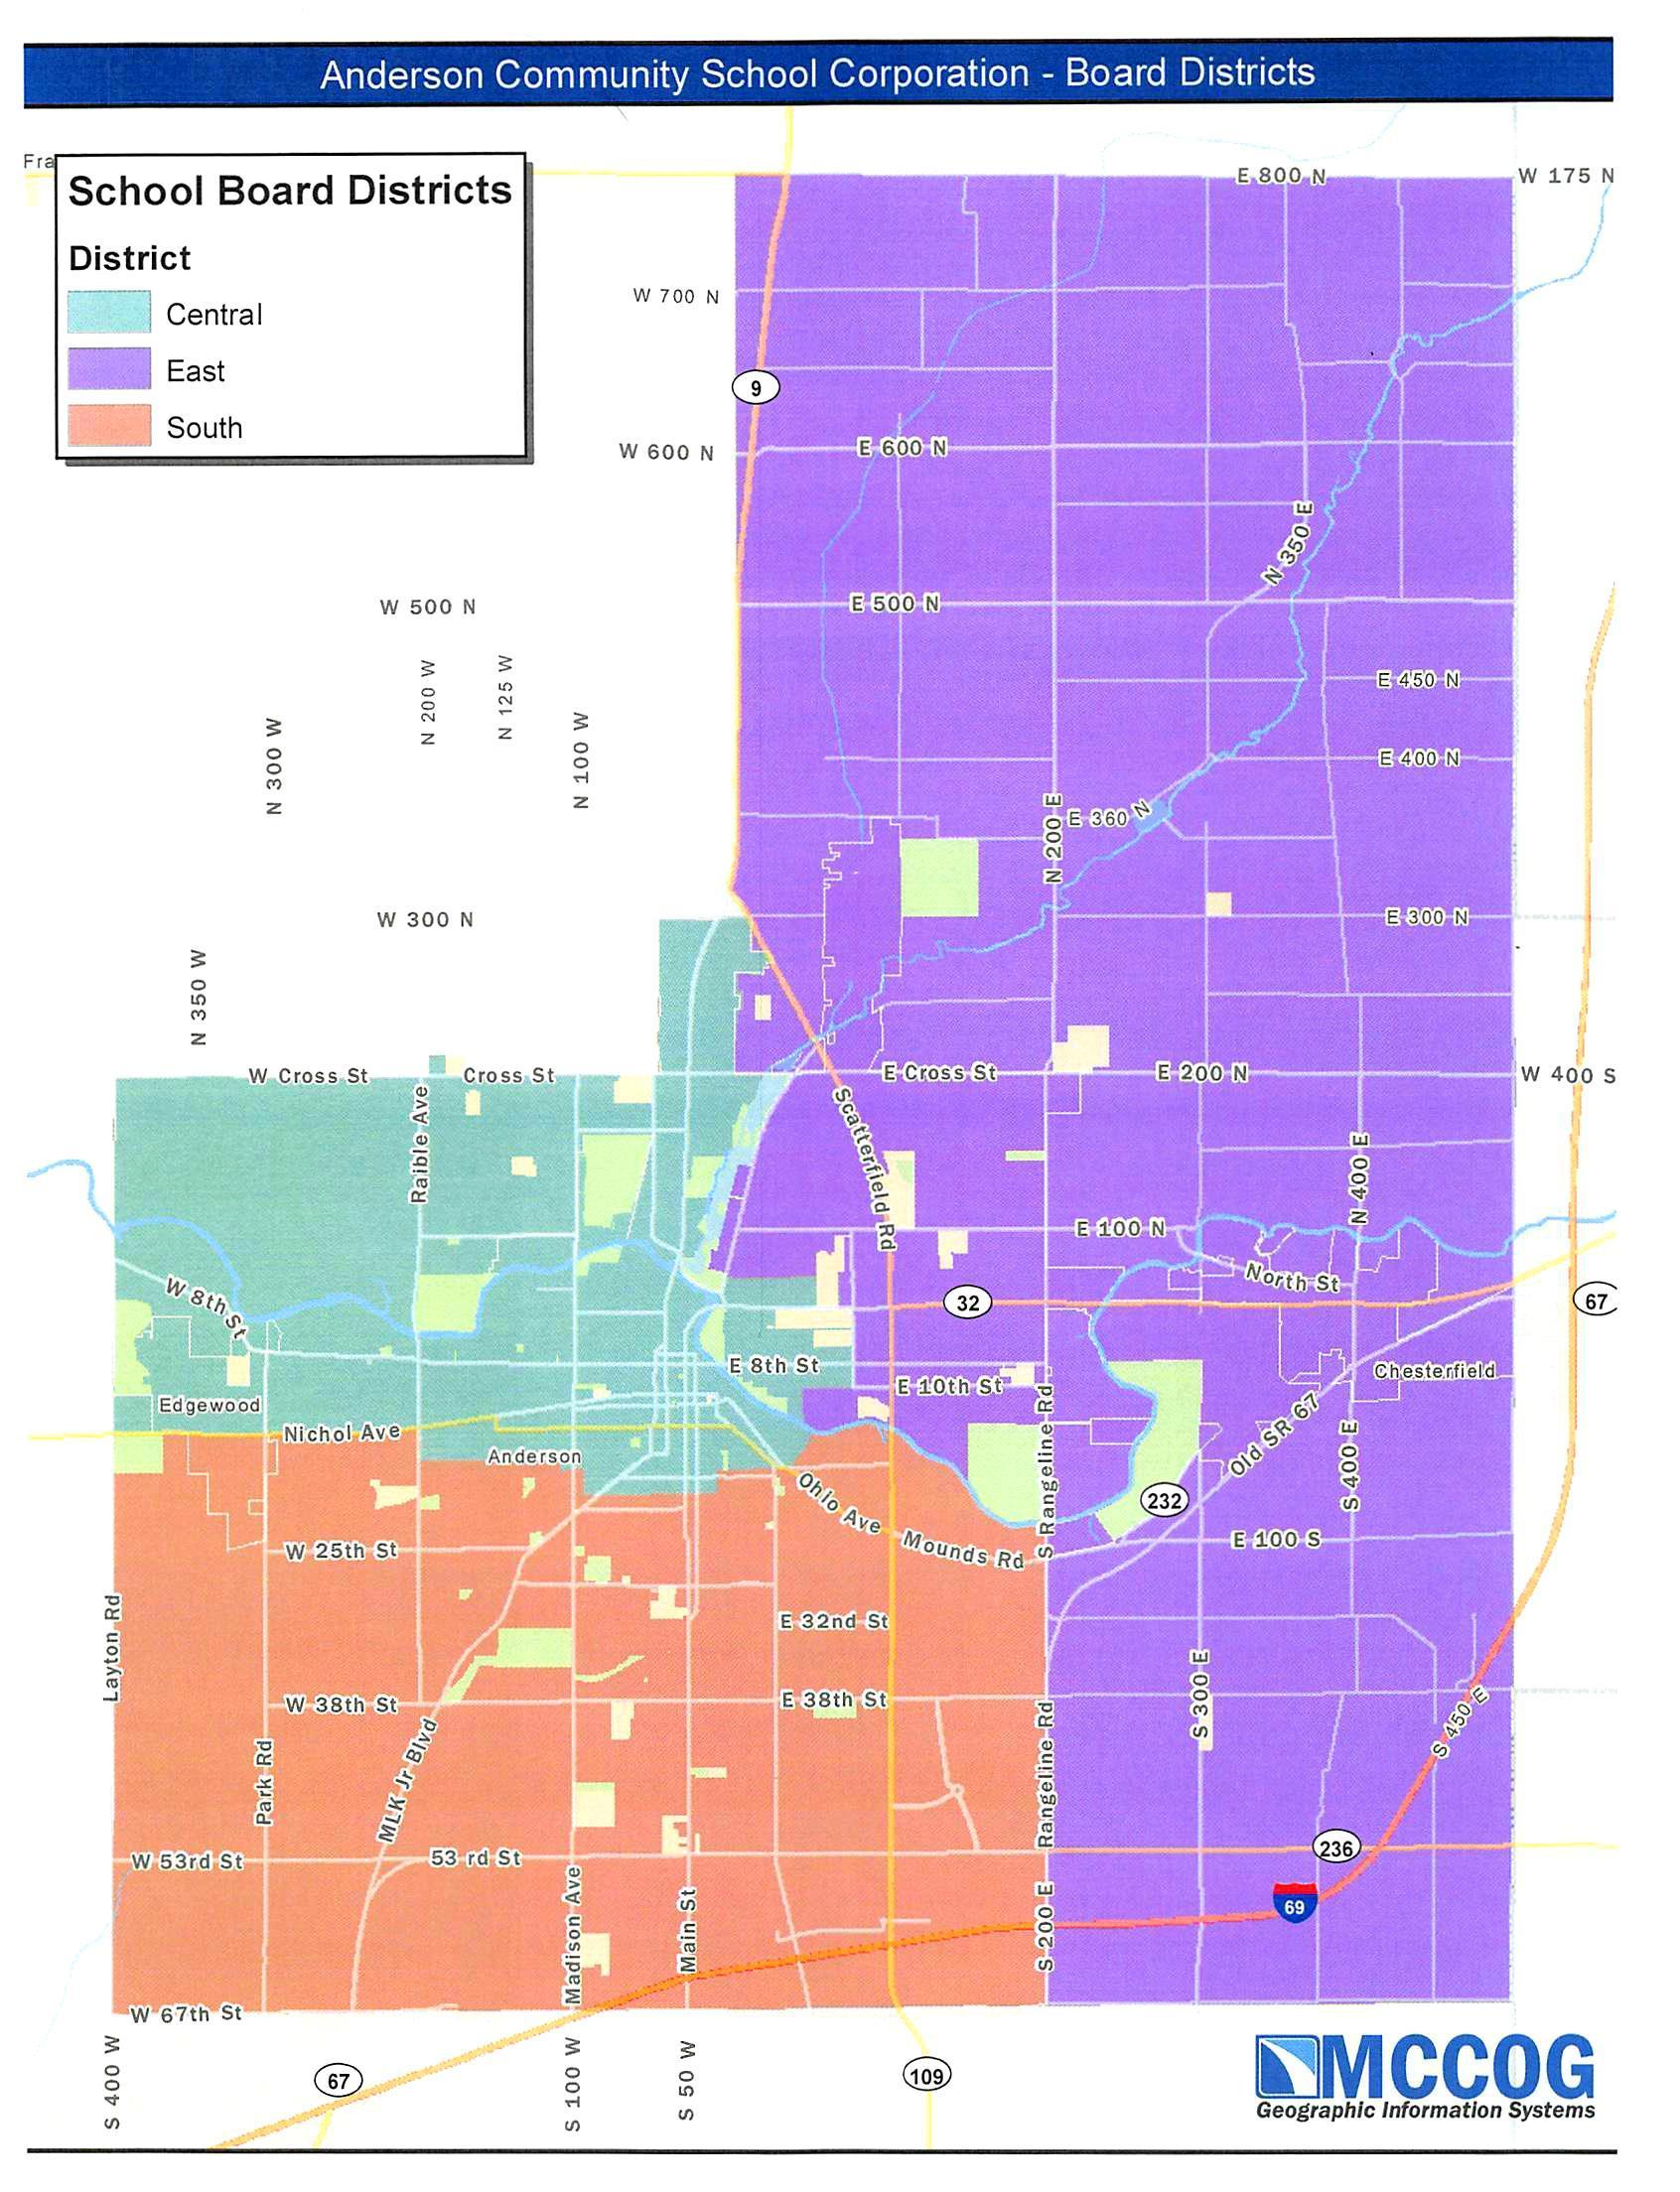 ACSC School Board Districts map